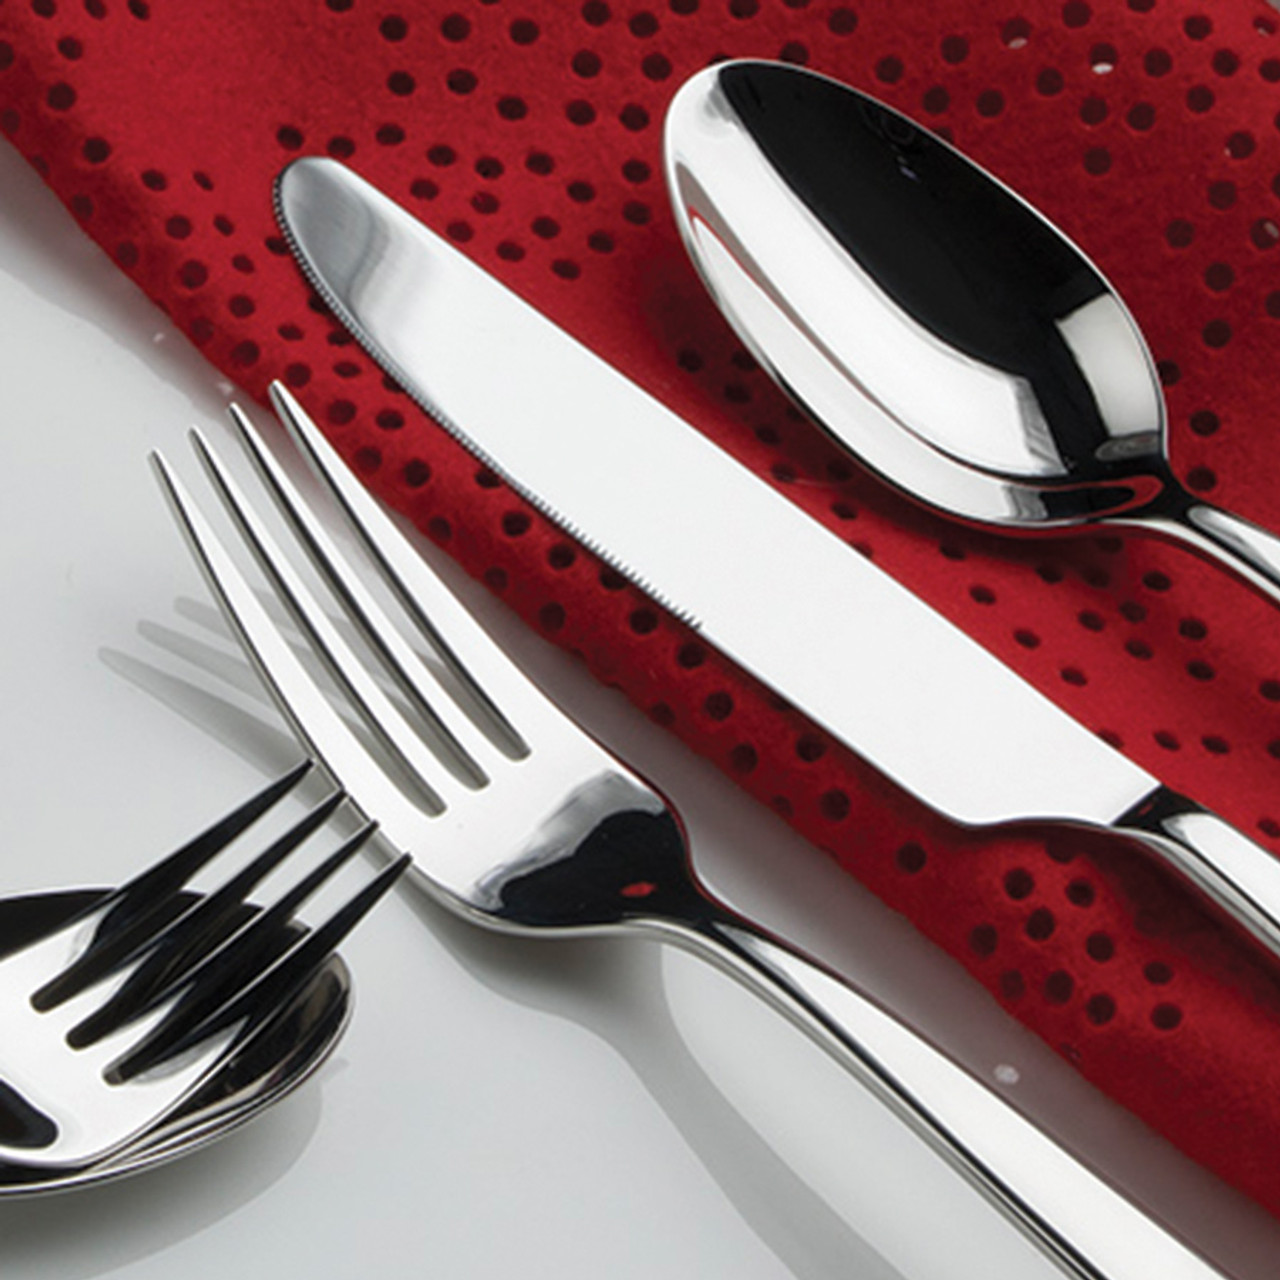 Resto flatware and cutlery